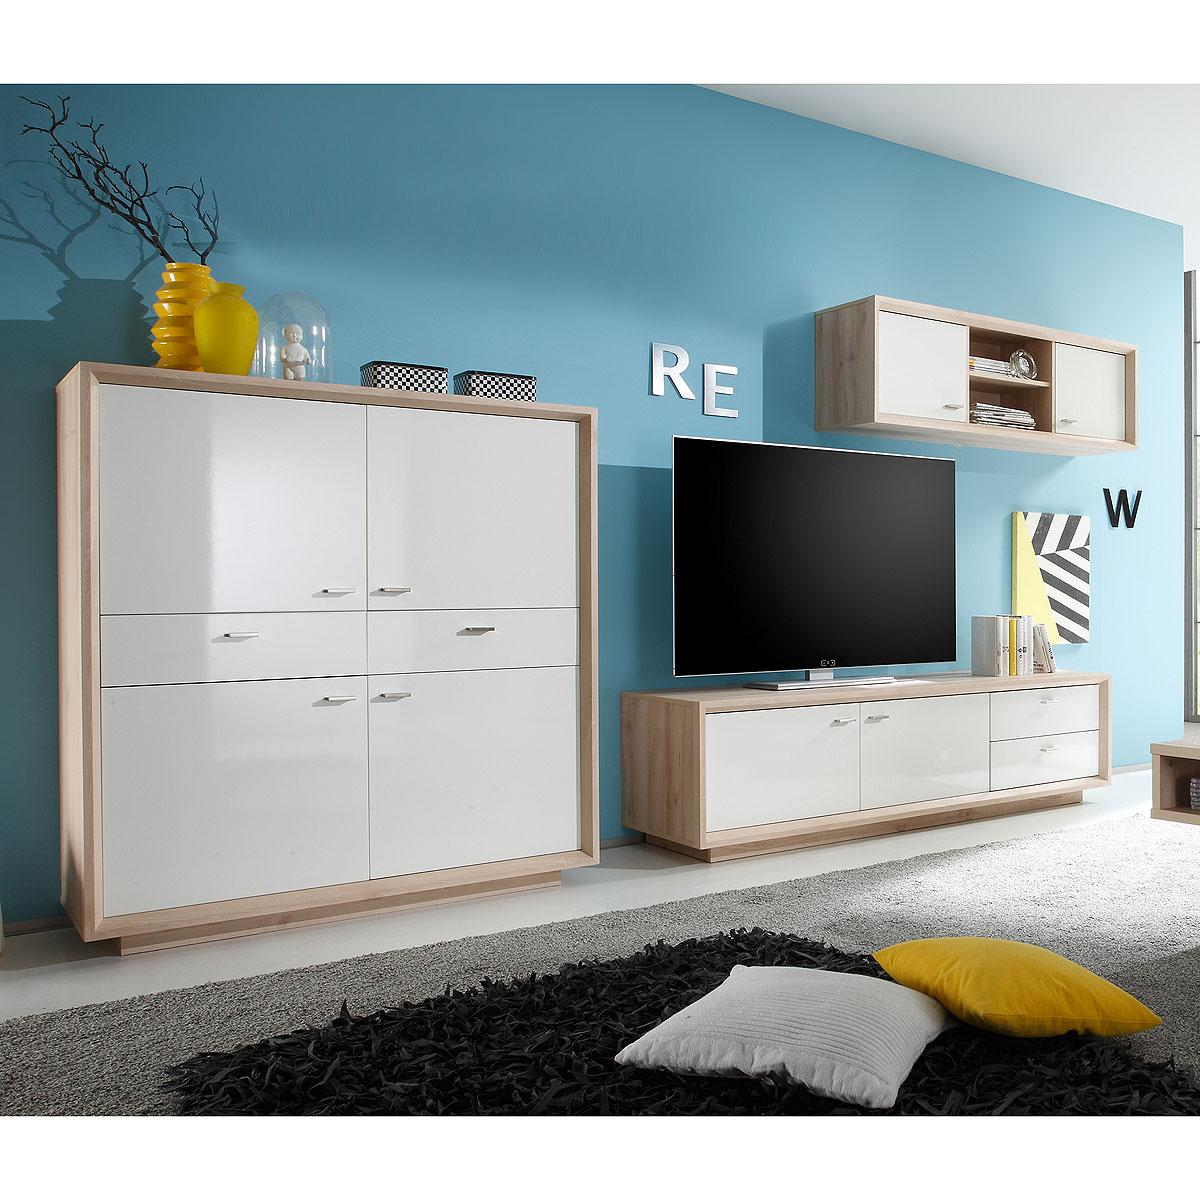 wohnwand 1 sven anbauwand wohnzimmer wohnkombi in. Black Bedroom Furniture Sets. Home Design Ideas